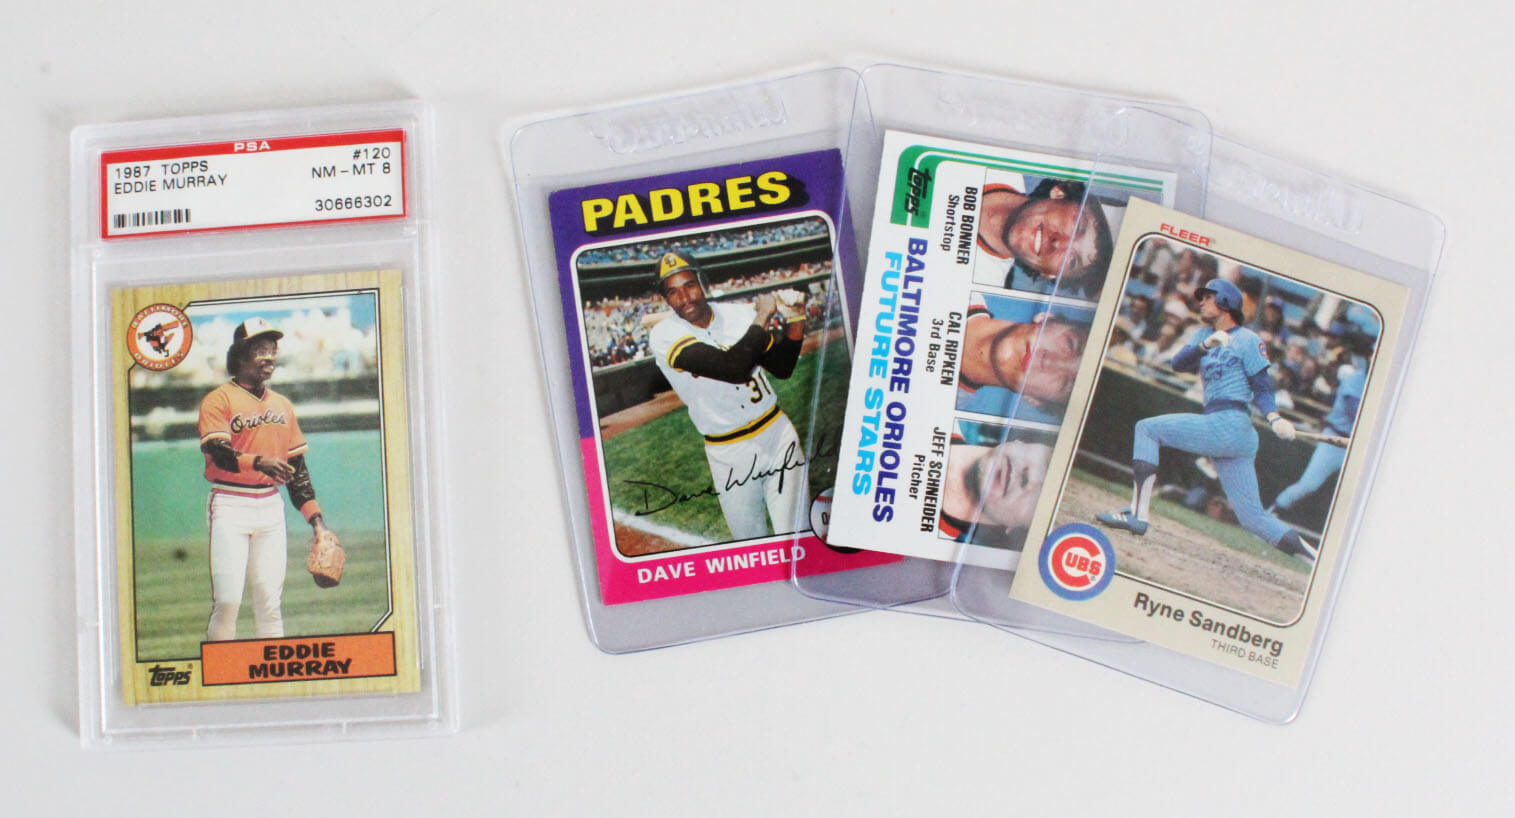 Baseball Card Lot 4 Incl Ryne Sandberg Rookie 1982 Topps Cal Ripken Jr Rc Eddie Murray Graded Etc